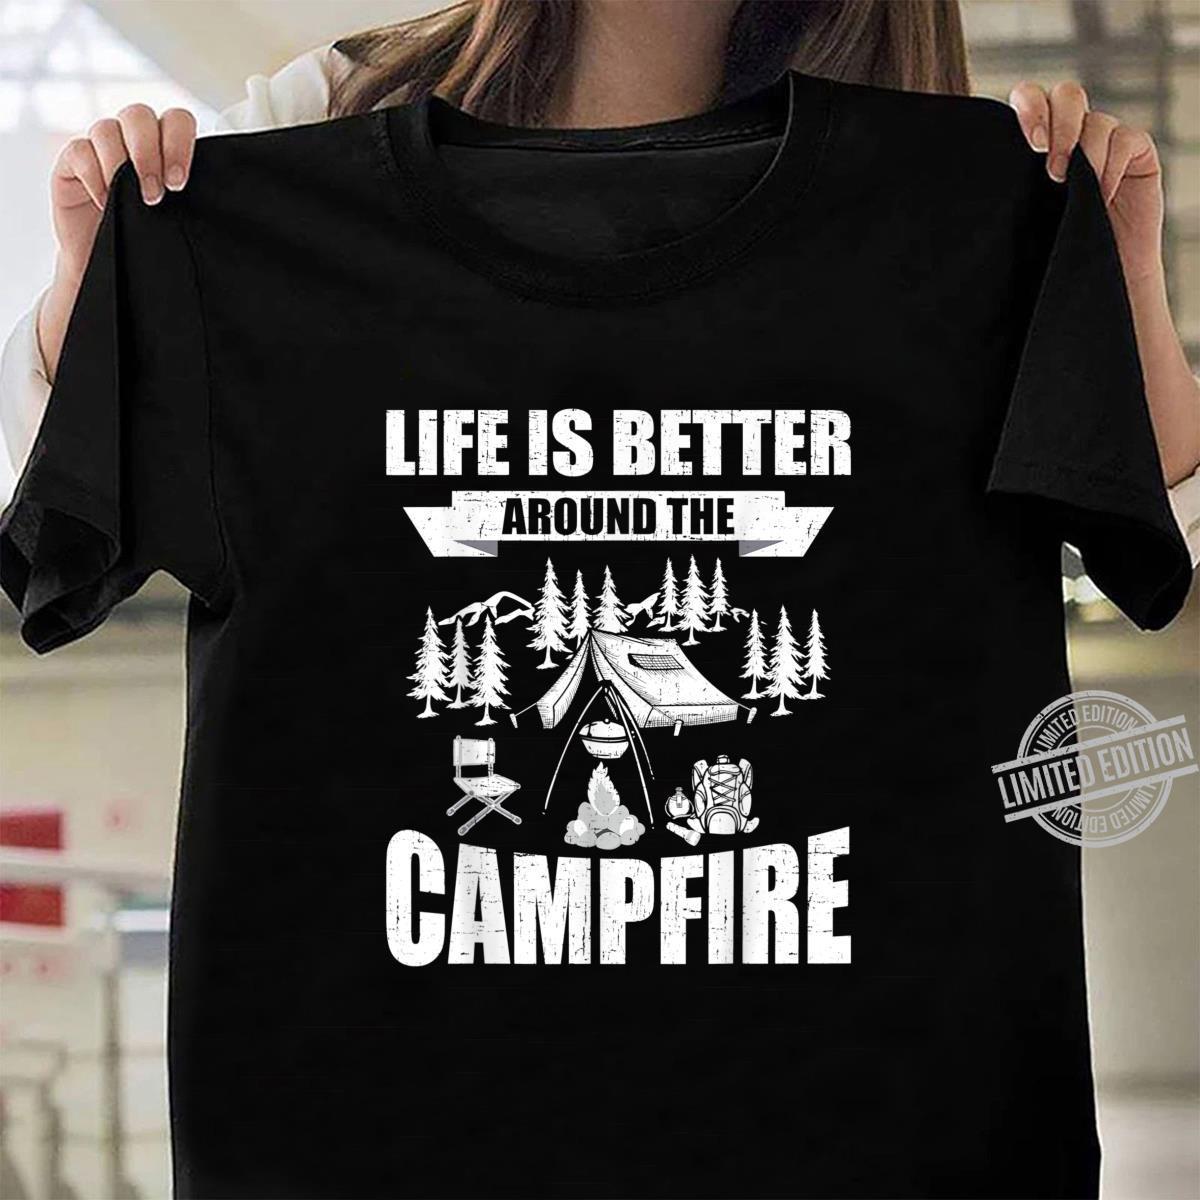 Nature Shirt Camping Shirt Camping Gifts Camping Apparel Camping Shirts Life Is Better Around The Campfire Camping Graphic Tee